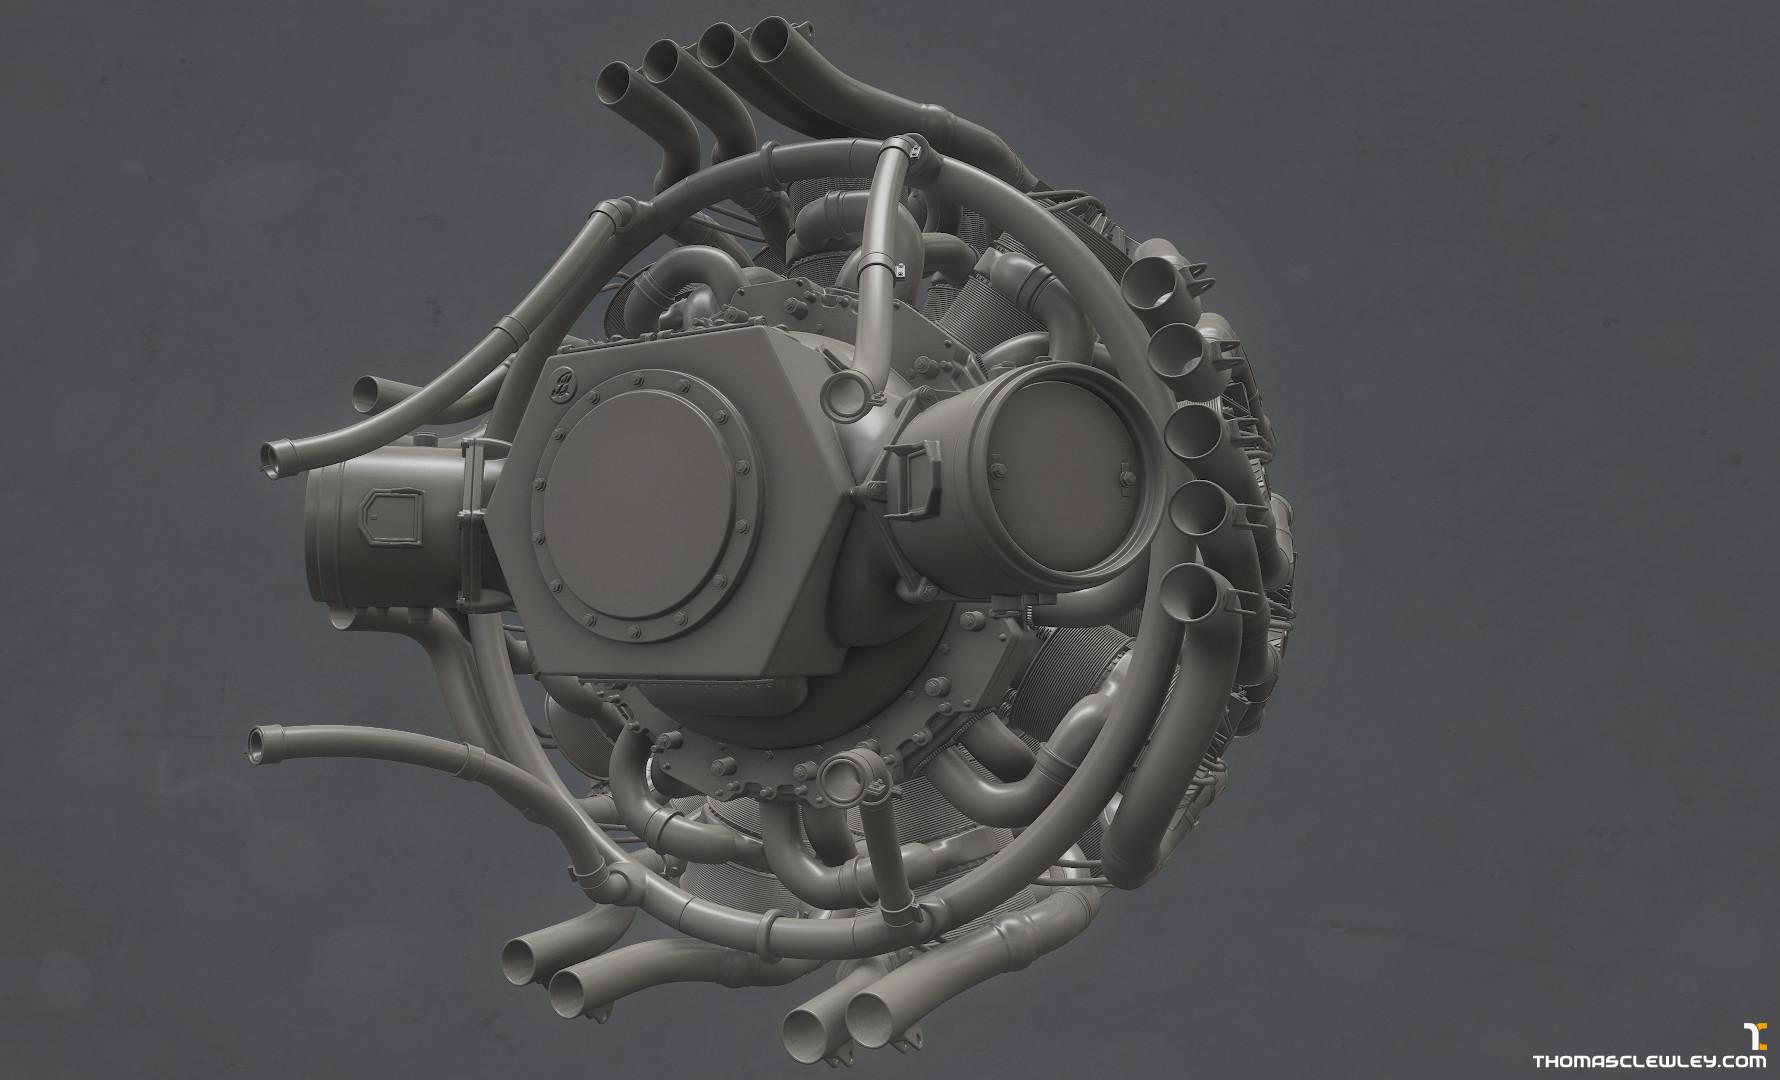 Thomas Clewley Bristol Centaurus Engine